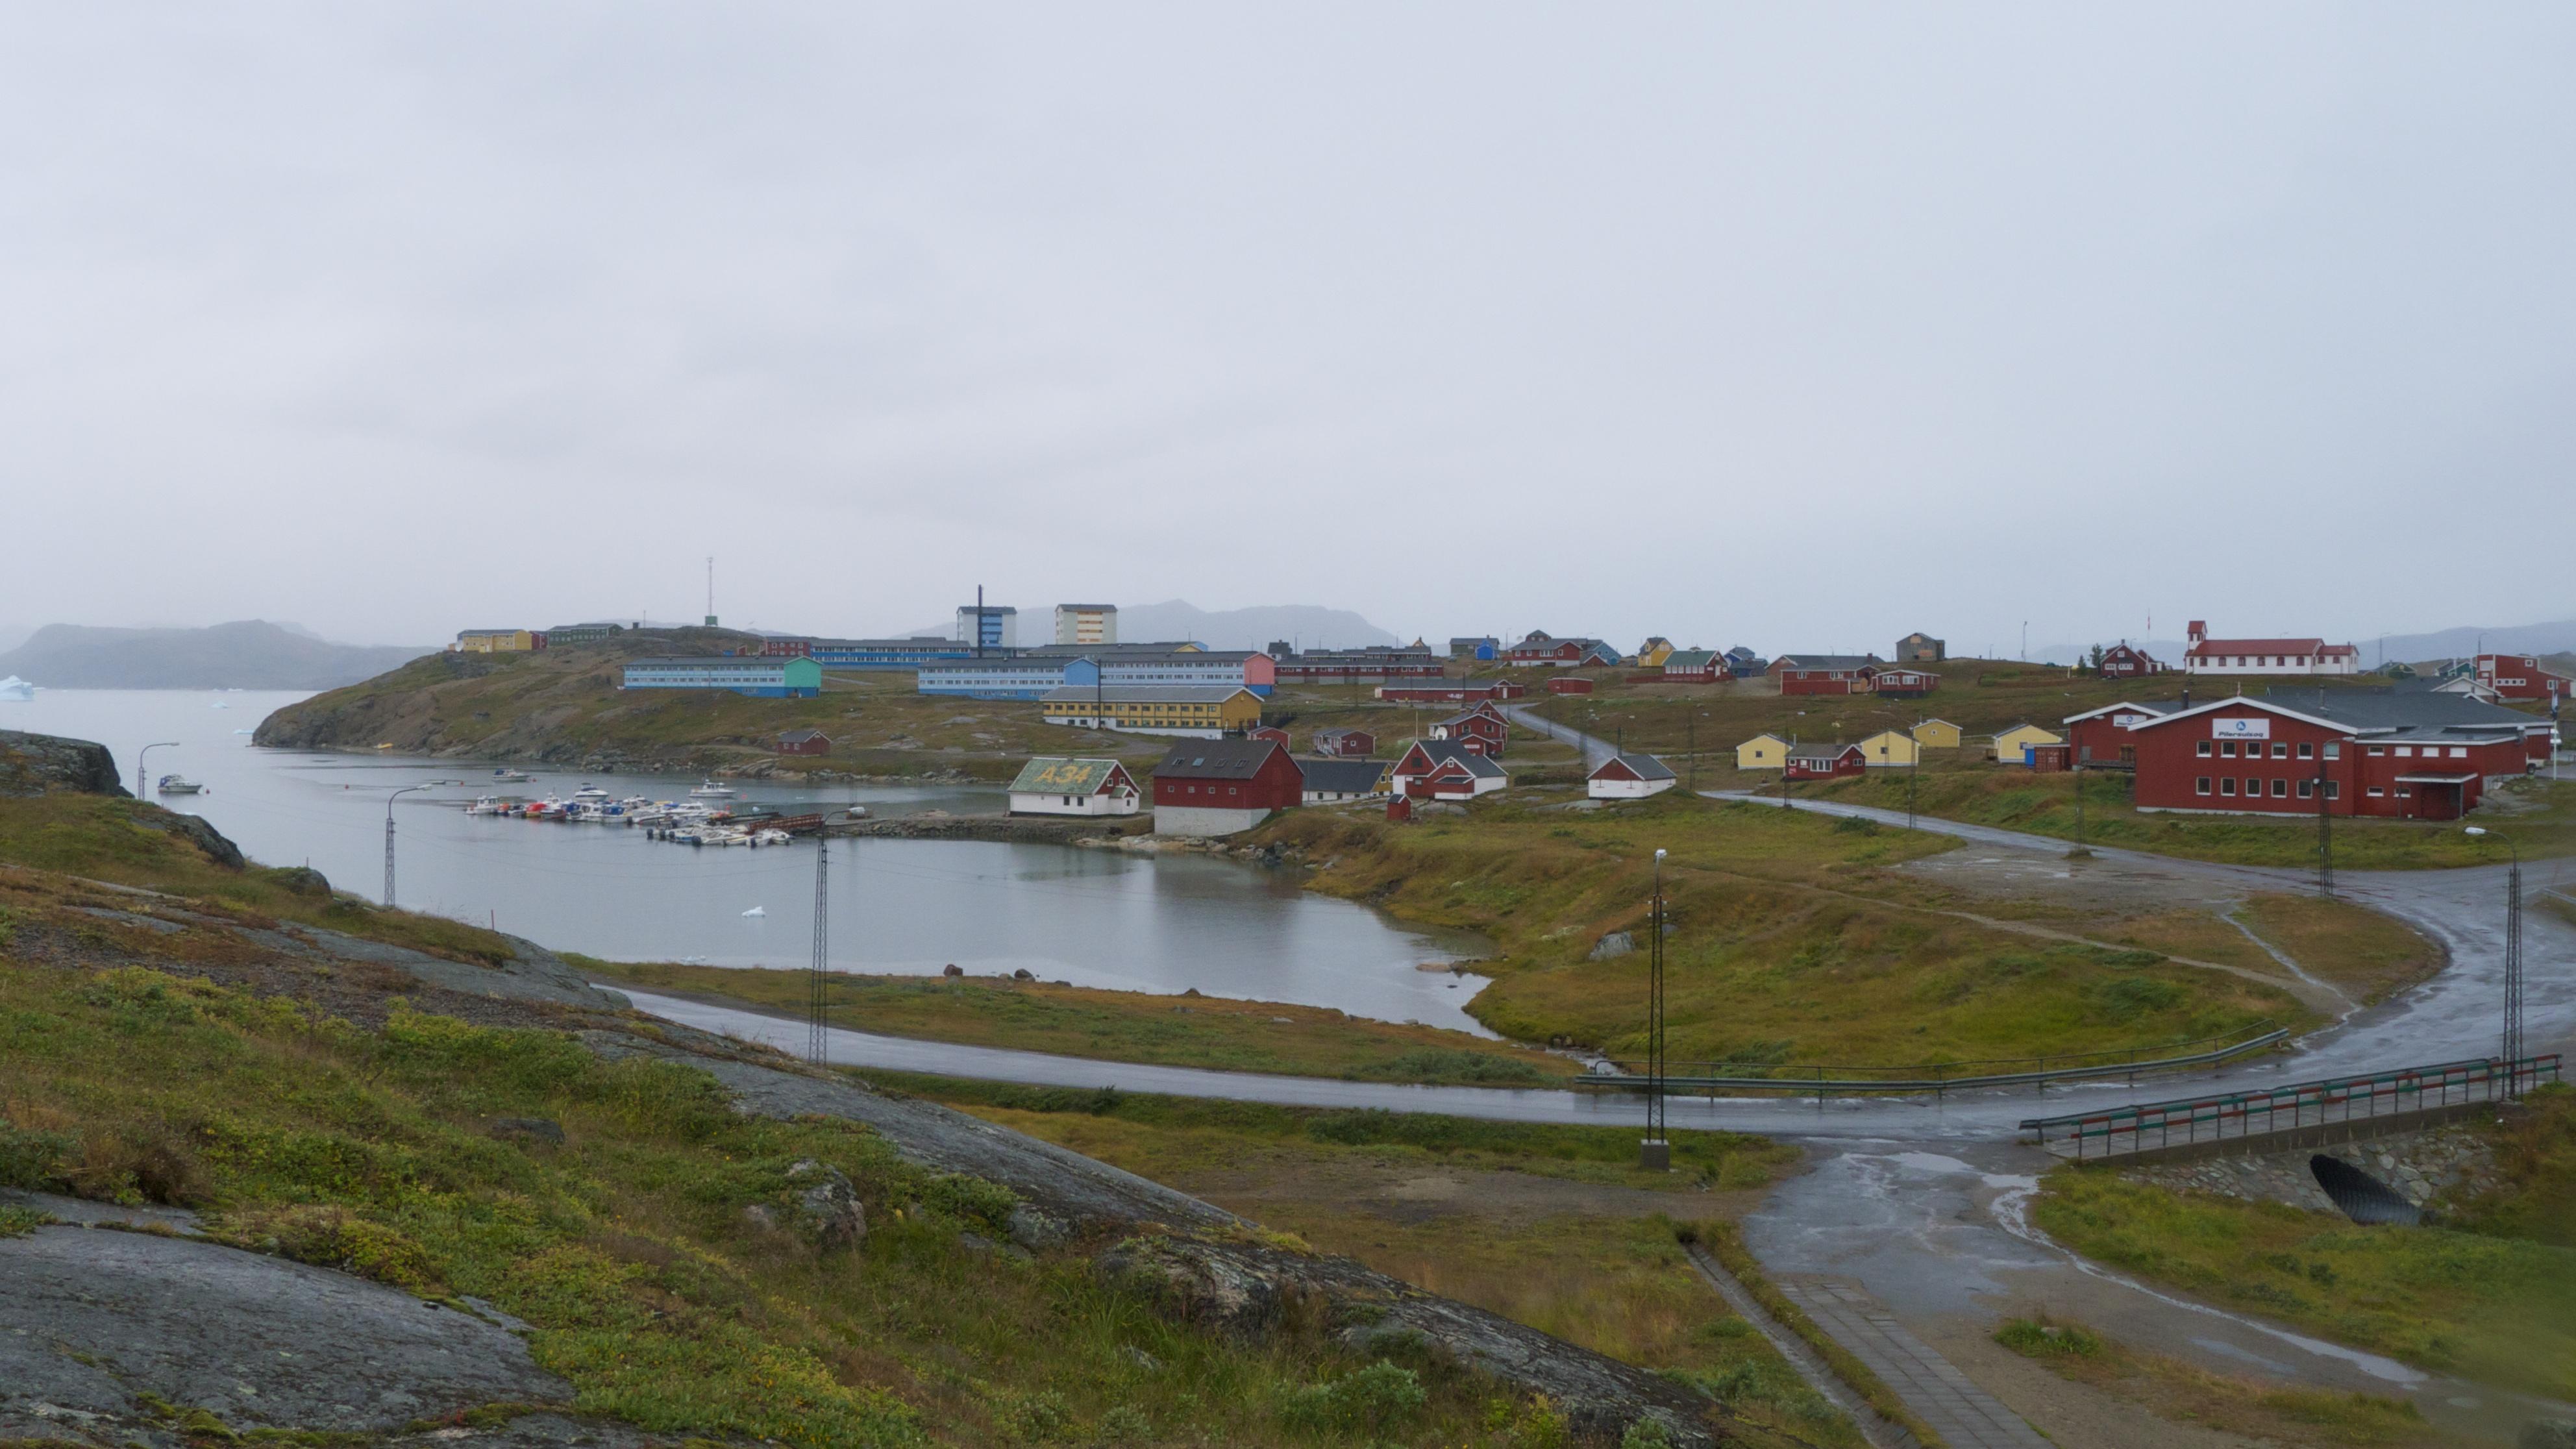 How teaching negotiation skills can benefit Arctic communities